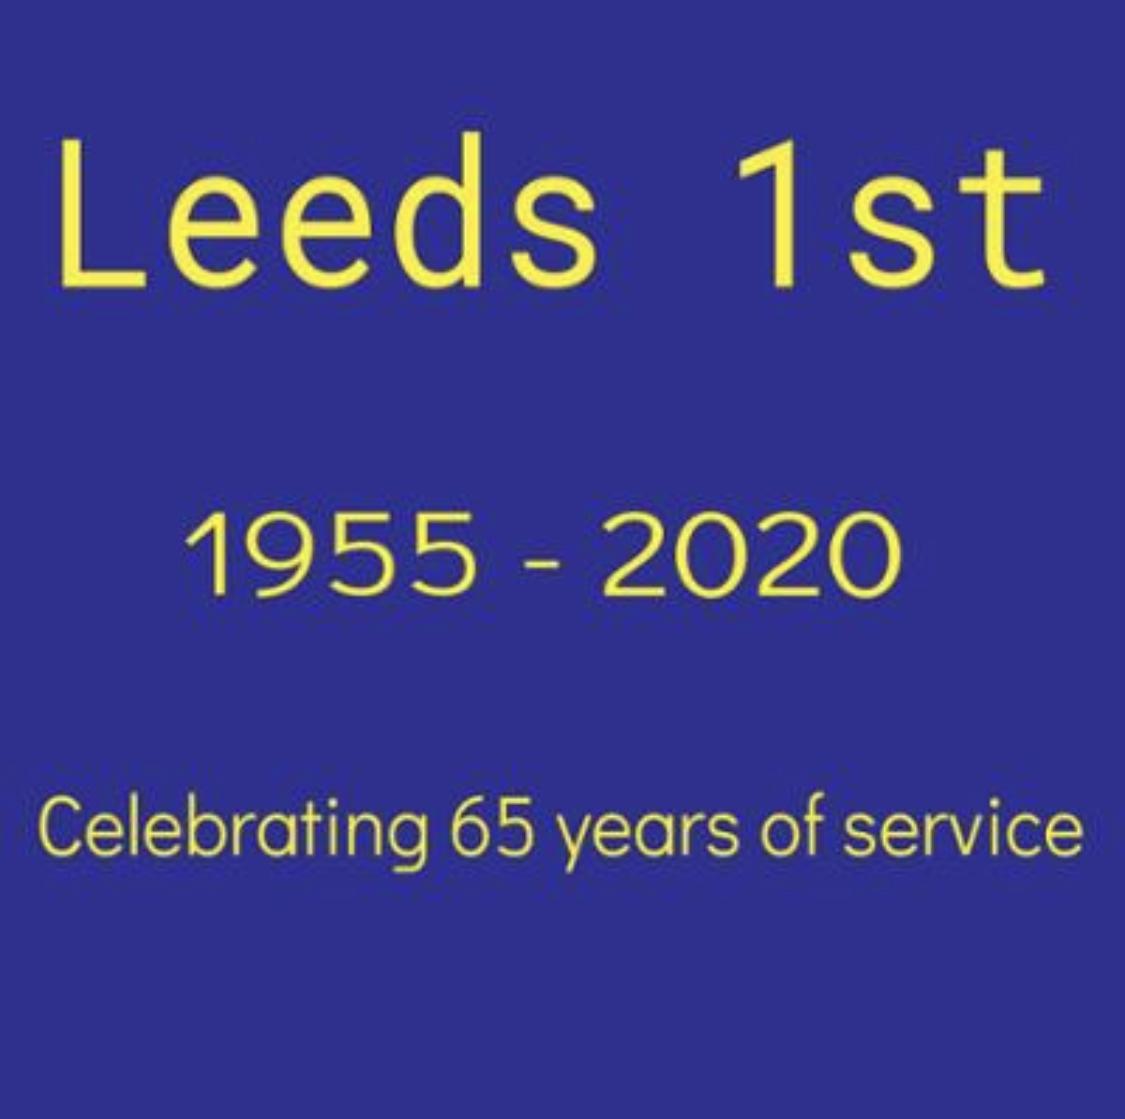 AA - Leeds 1st - Woodsley Road